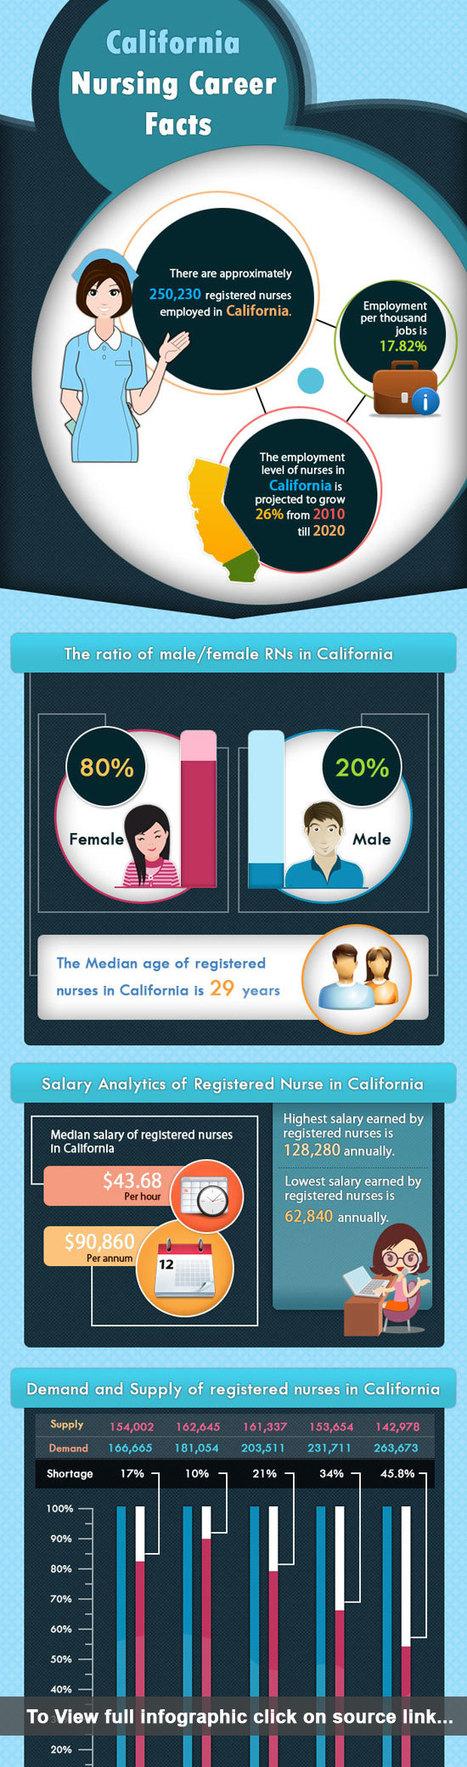 California Nursing Career Facts - INFOGRAPHICS | Nursing Blogs | Scoop.it